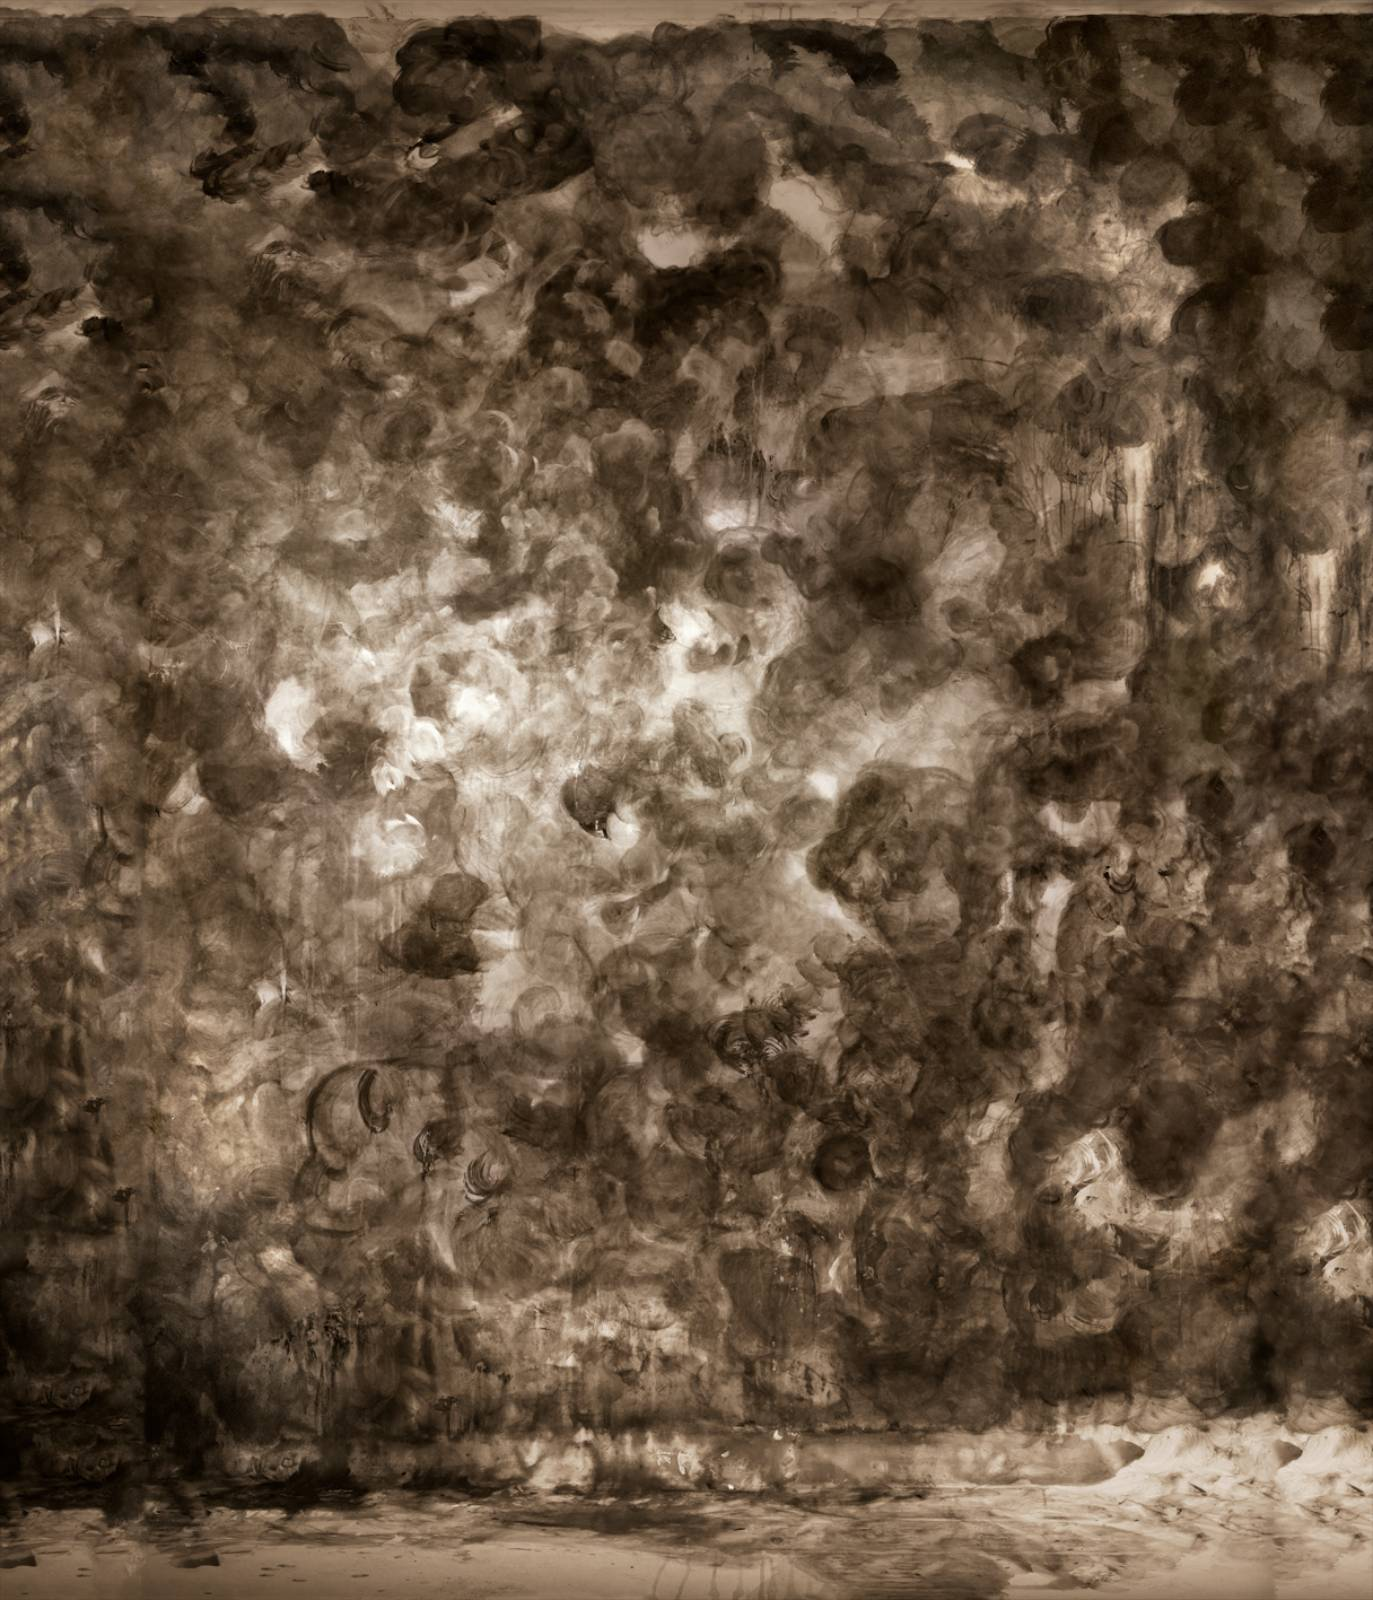 Sassy Swank Set Exposed I, 2014, pigment print on aluminium, 150 x 127 cm, ed. 5